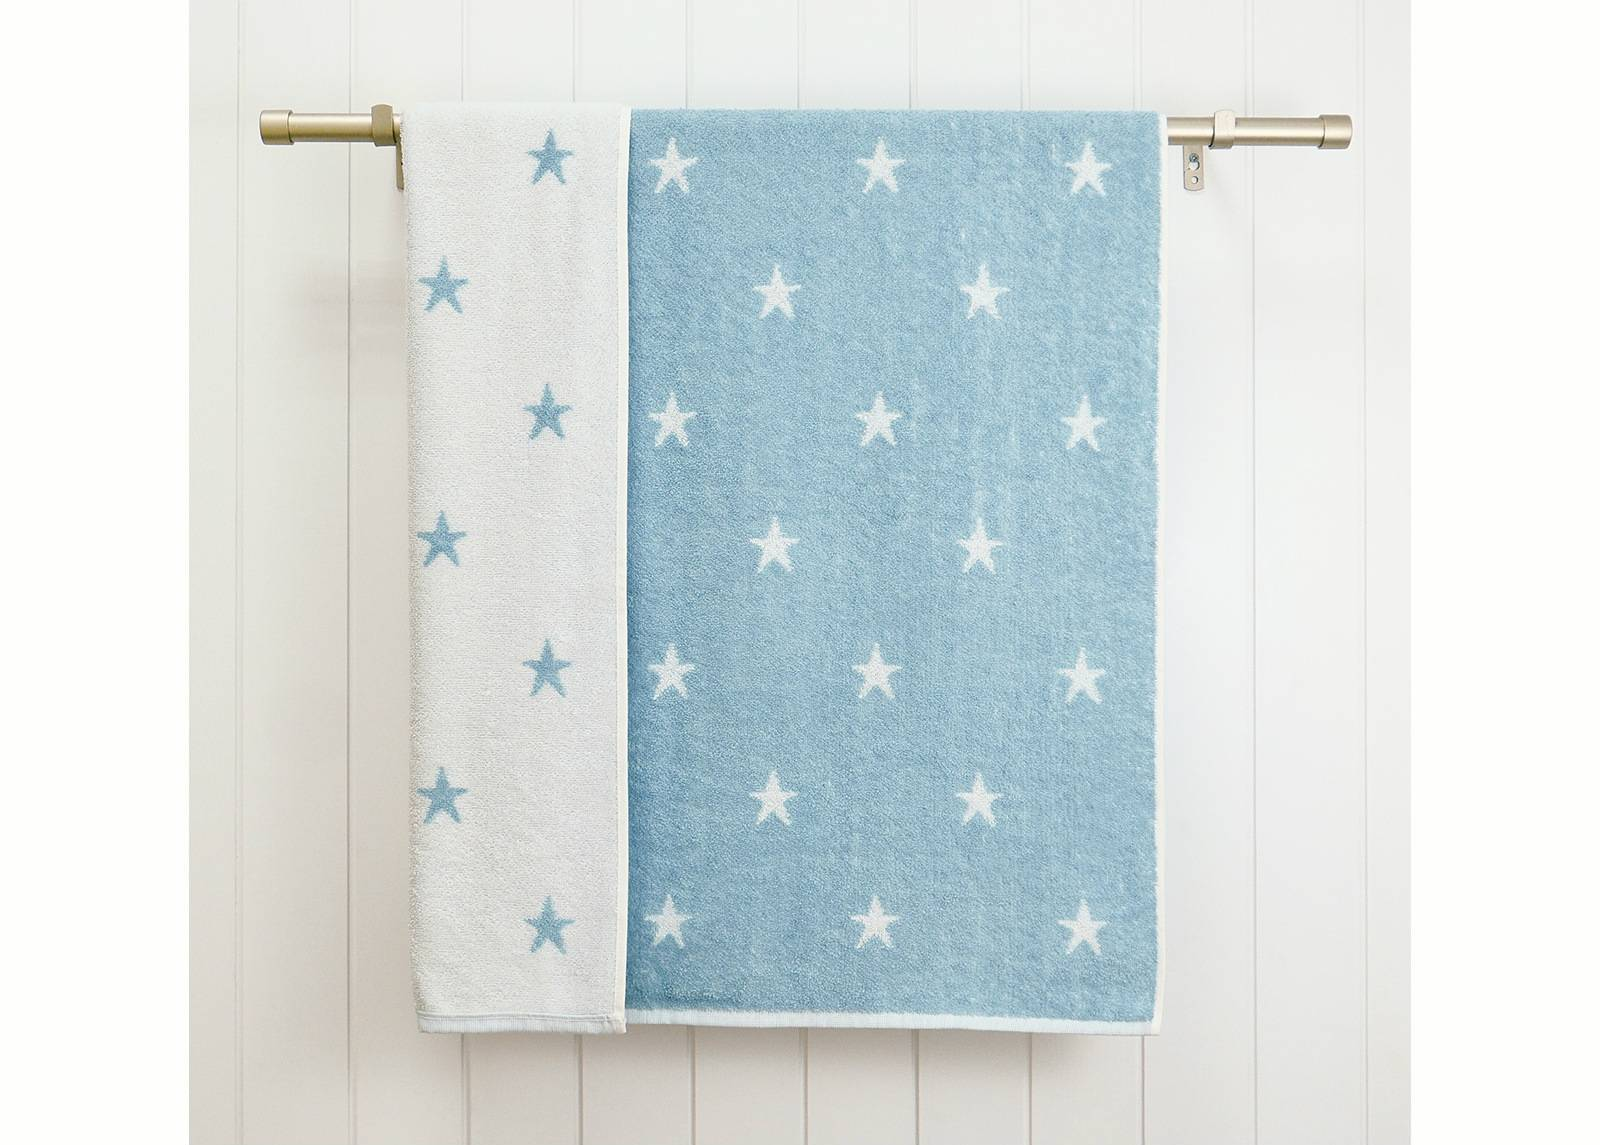 ARDENZA BABY Lasten froteepyyhe Stars 70x120 cm, sininen